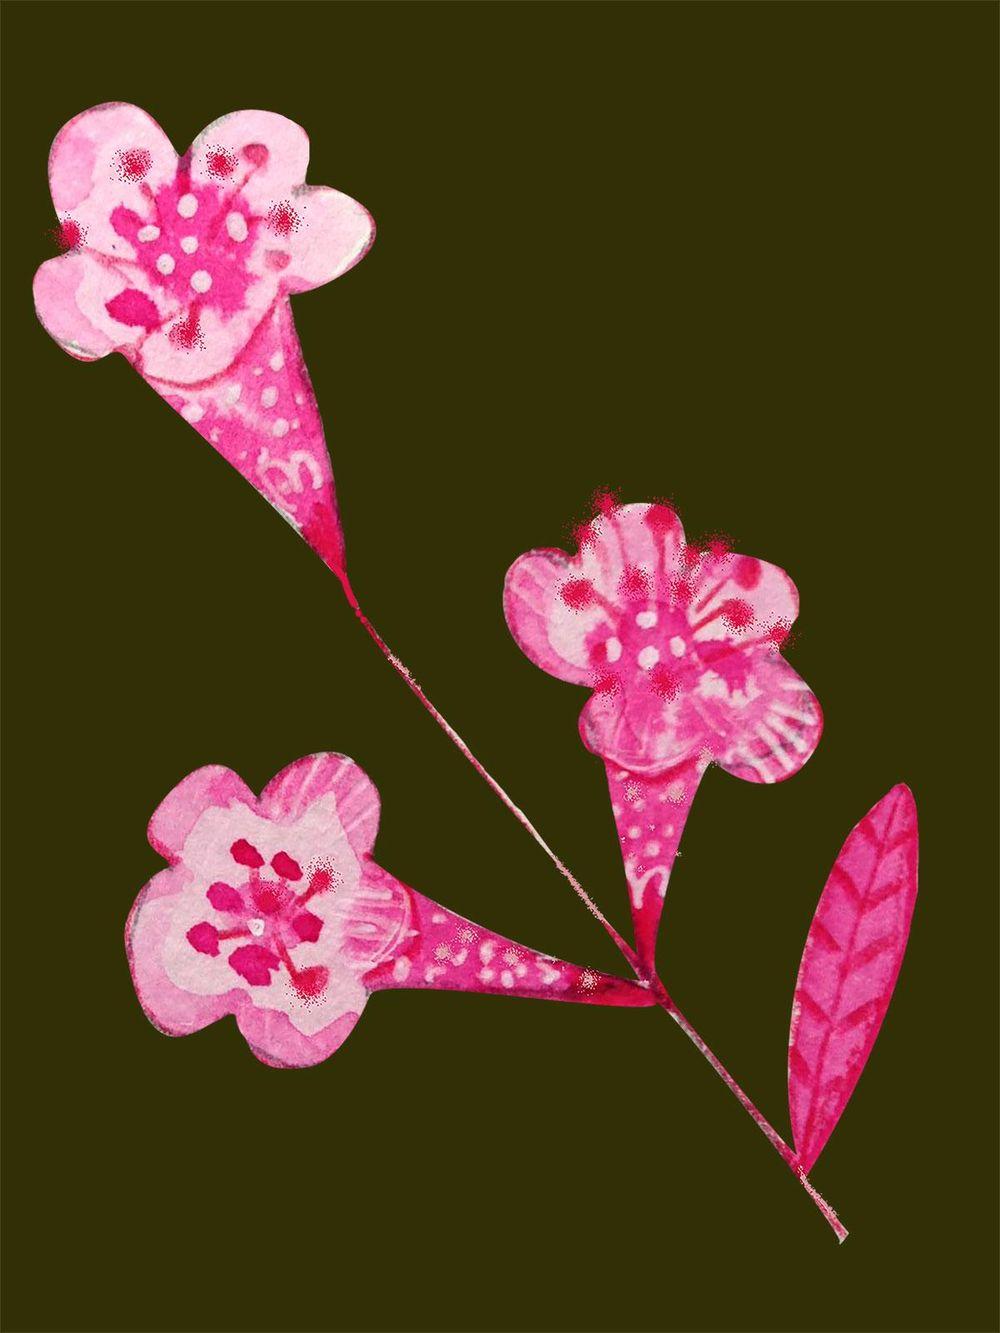 flower cutout practice - image 1 - student project